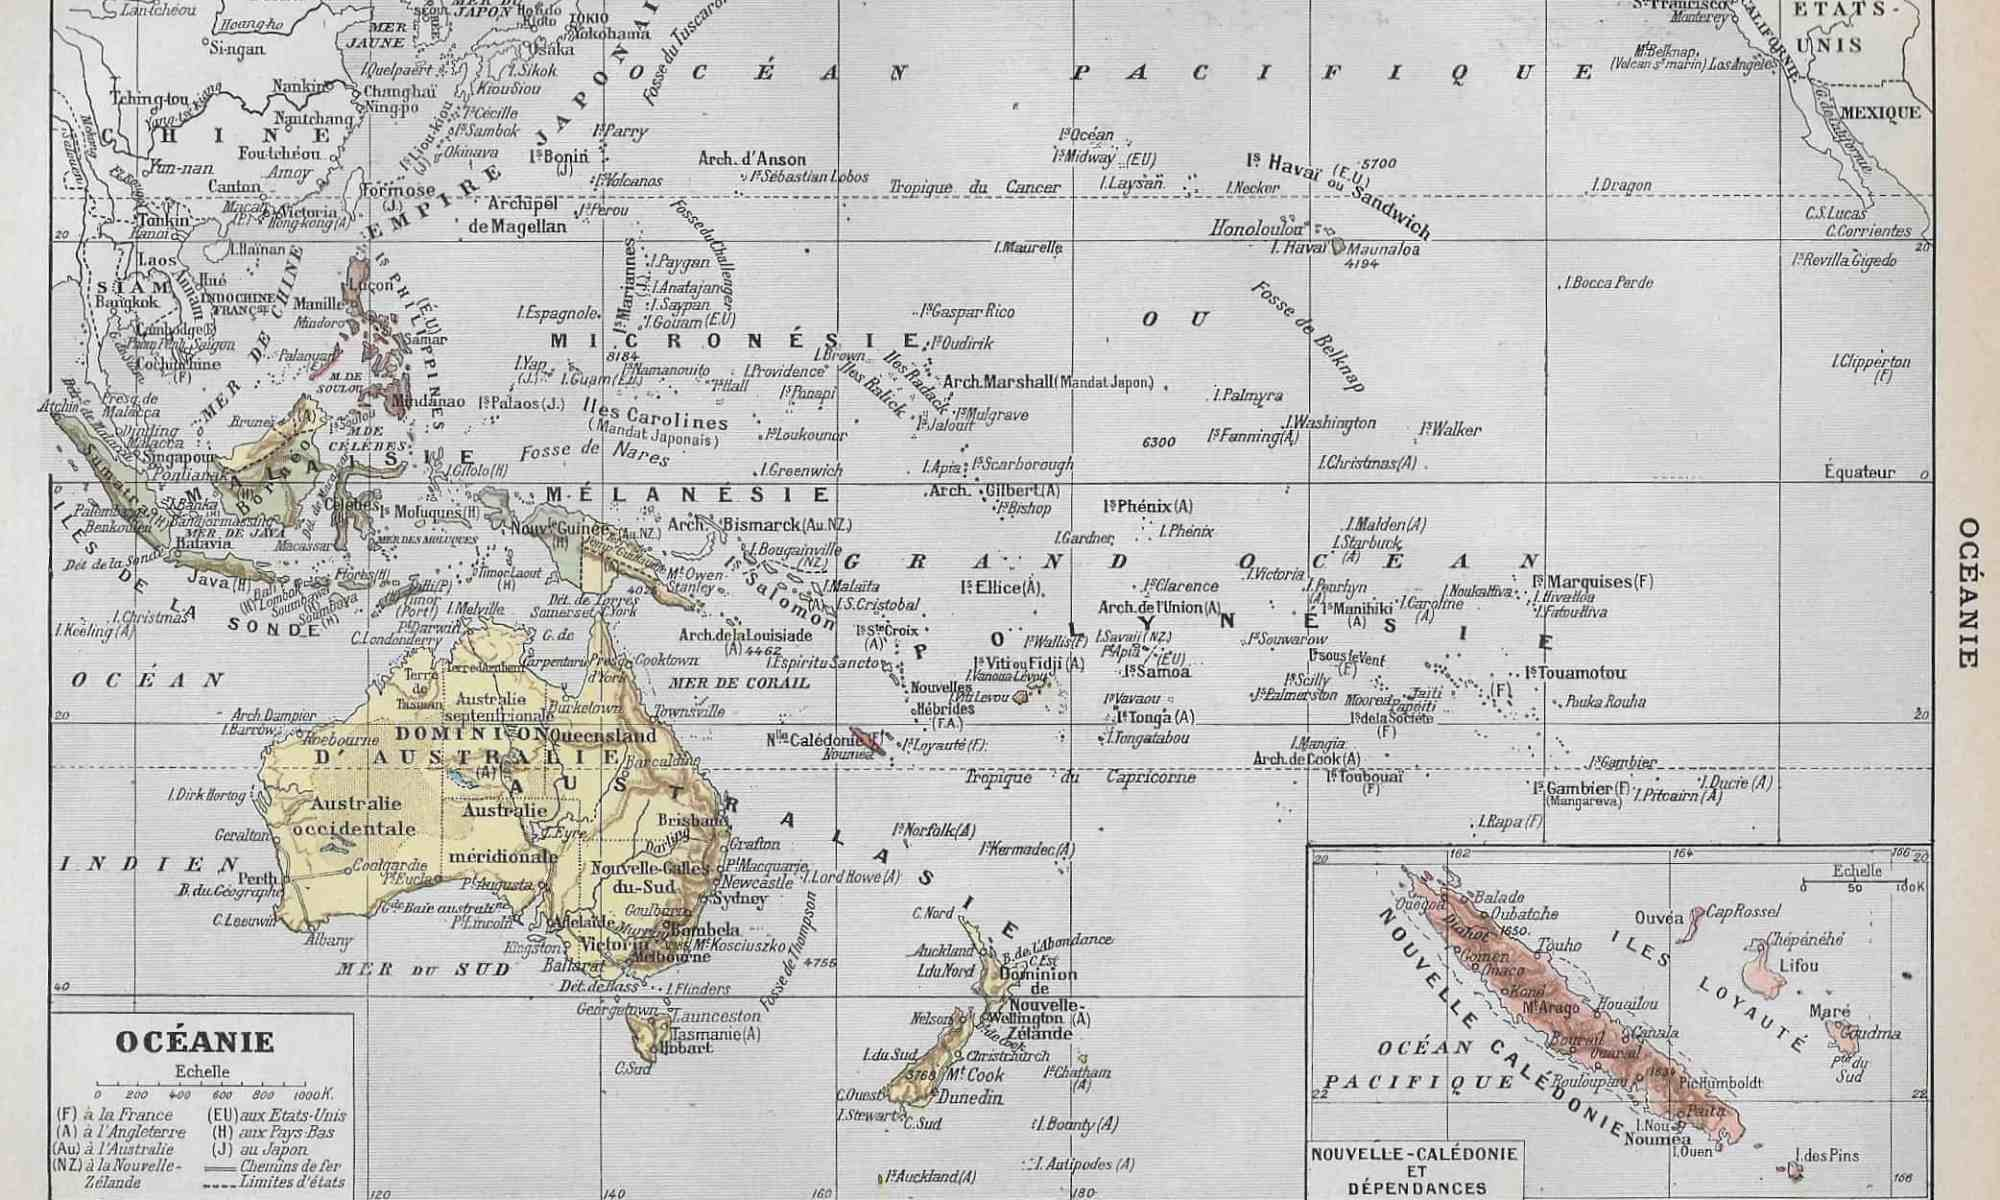 #2940 Oceania 1922